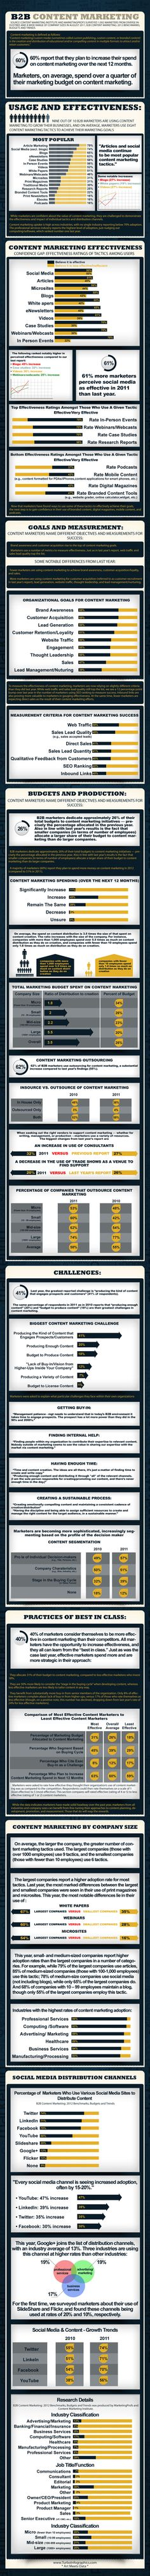 #B2B #Content #Marketing. #Infographic